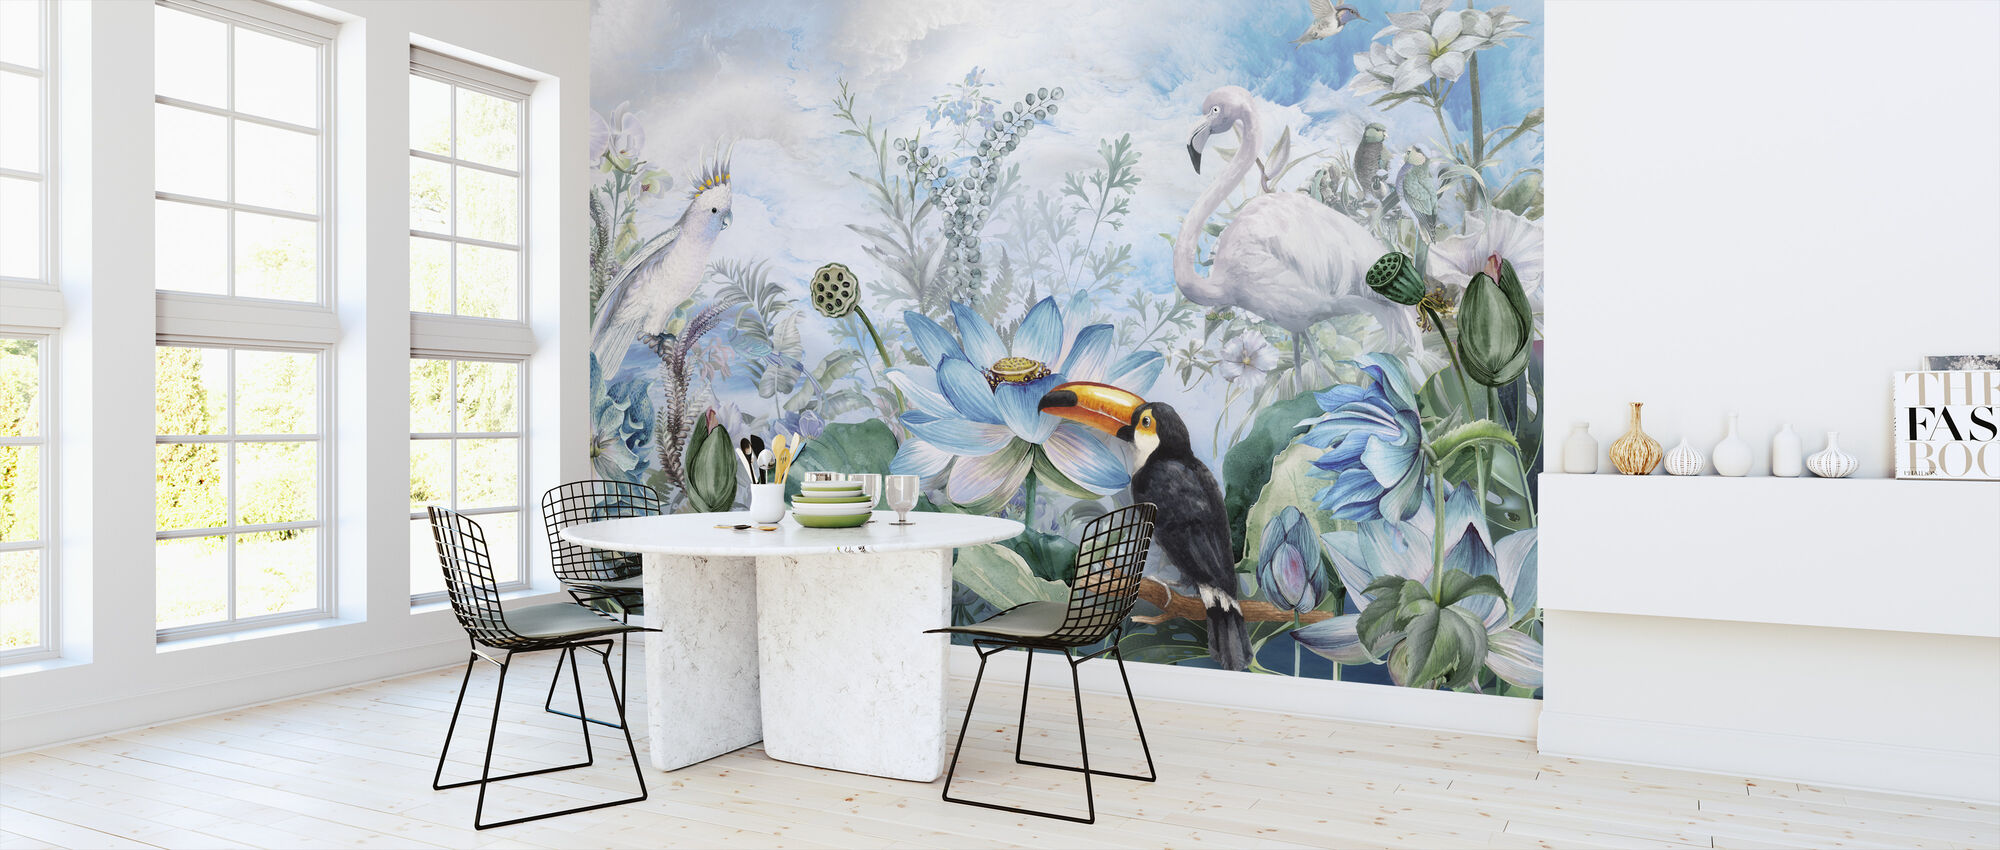 Birds in Blue Vegetation - Wallpaper - Kitchen